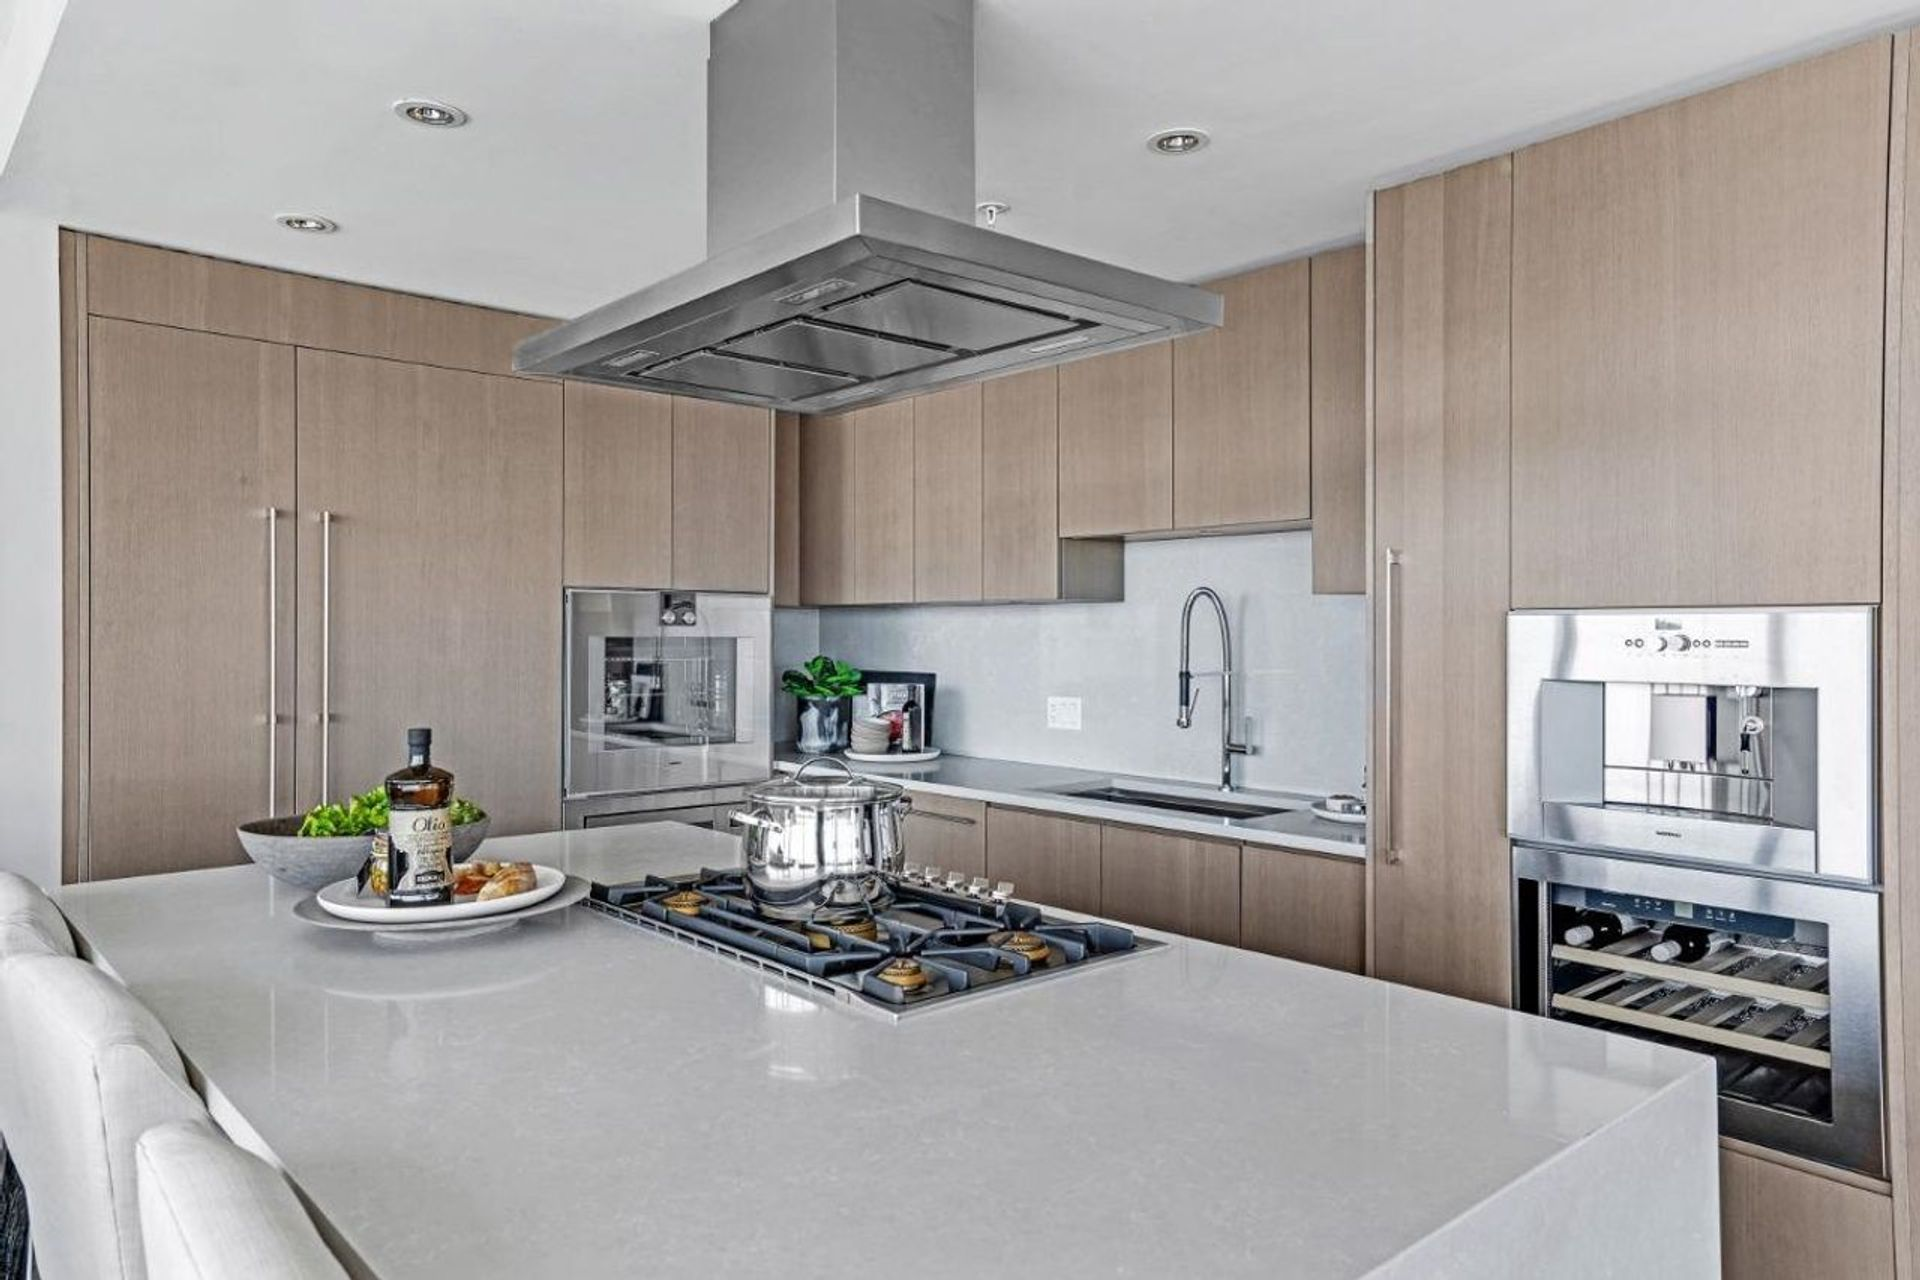 210-salter-street-queensborough-new-westminster-07 at 2103 - 210 Salter Street, Queensborough, New Westminster